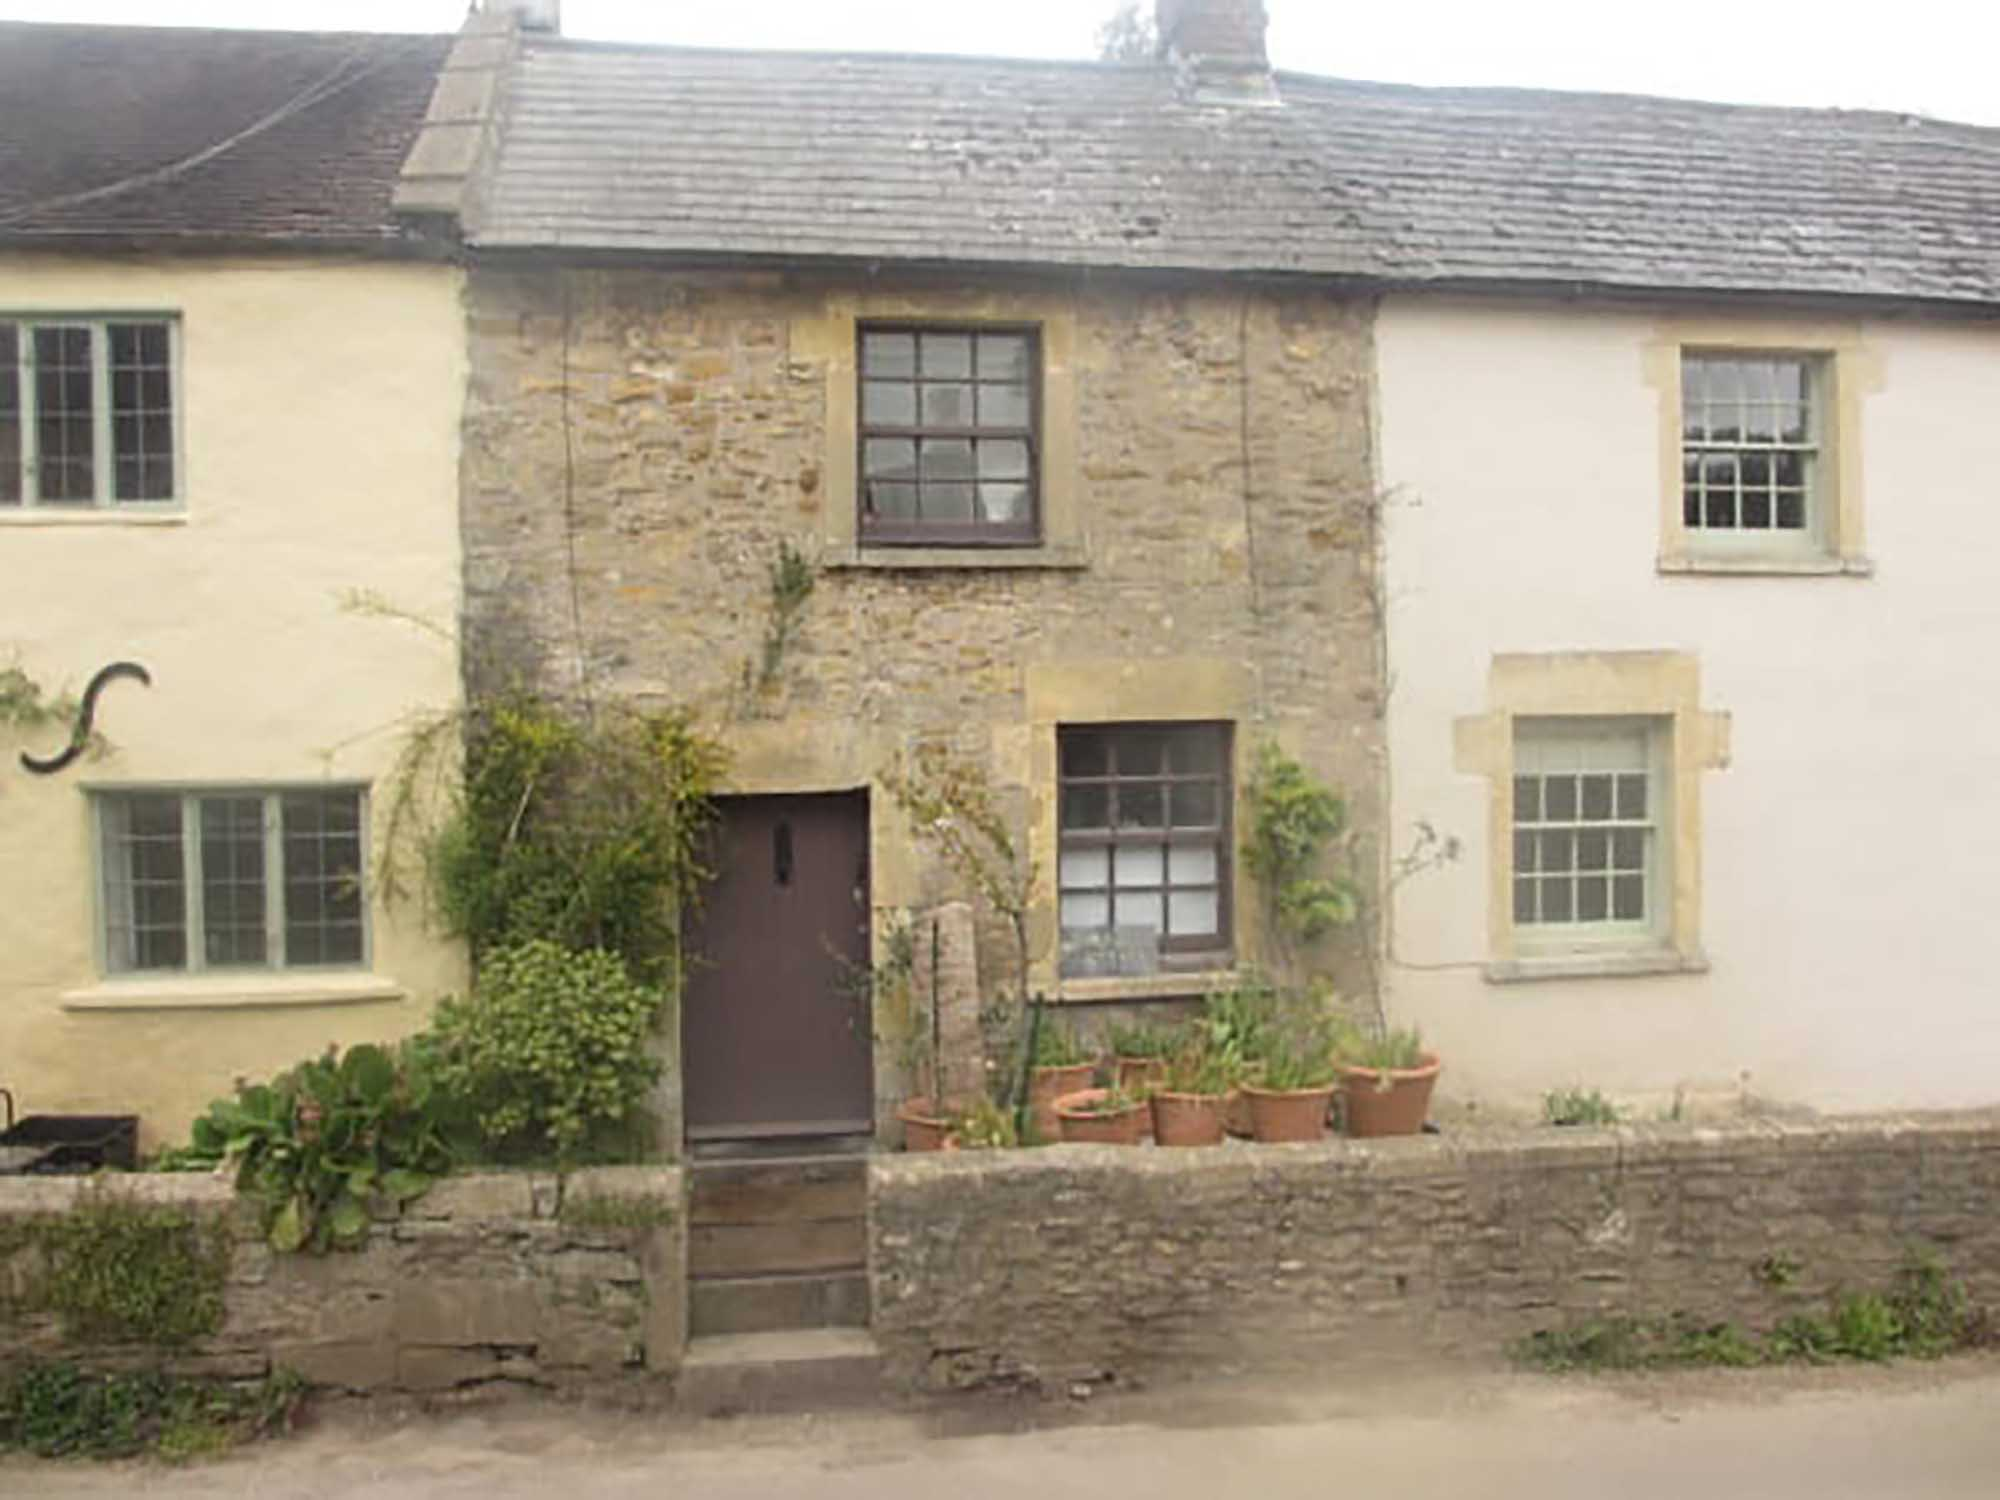 Mole Cottage, Kale Street, Batcombe